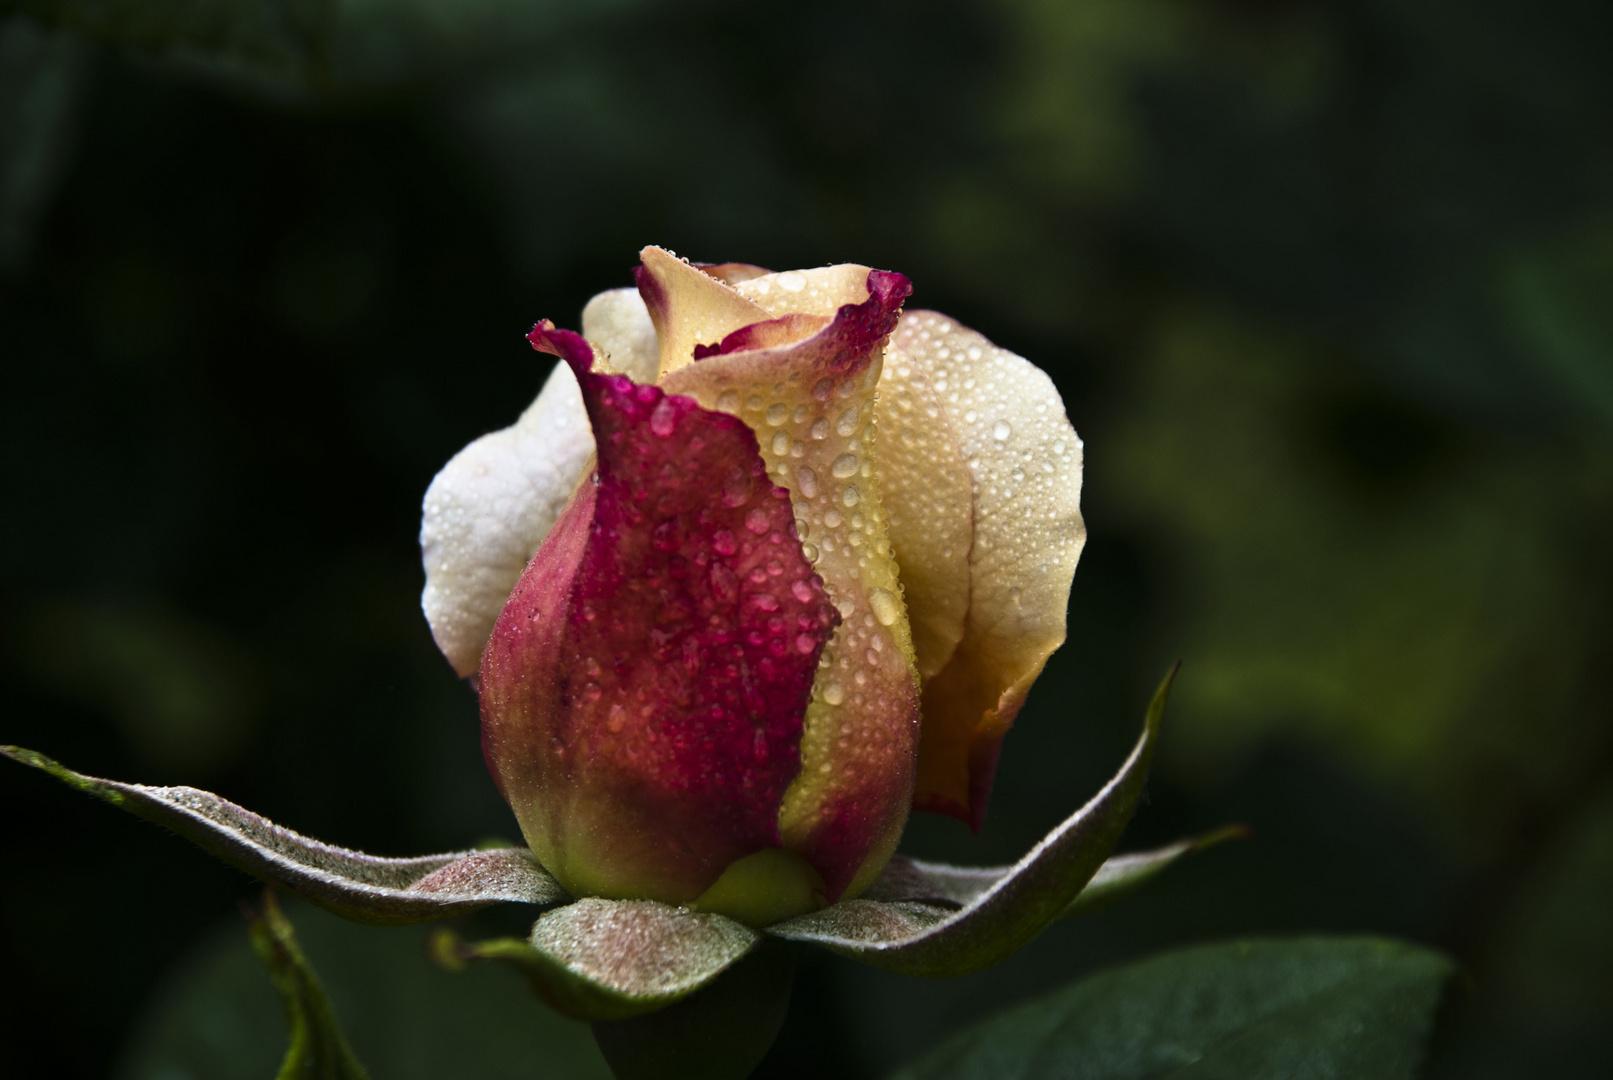 Rosa rociera